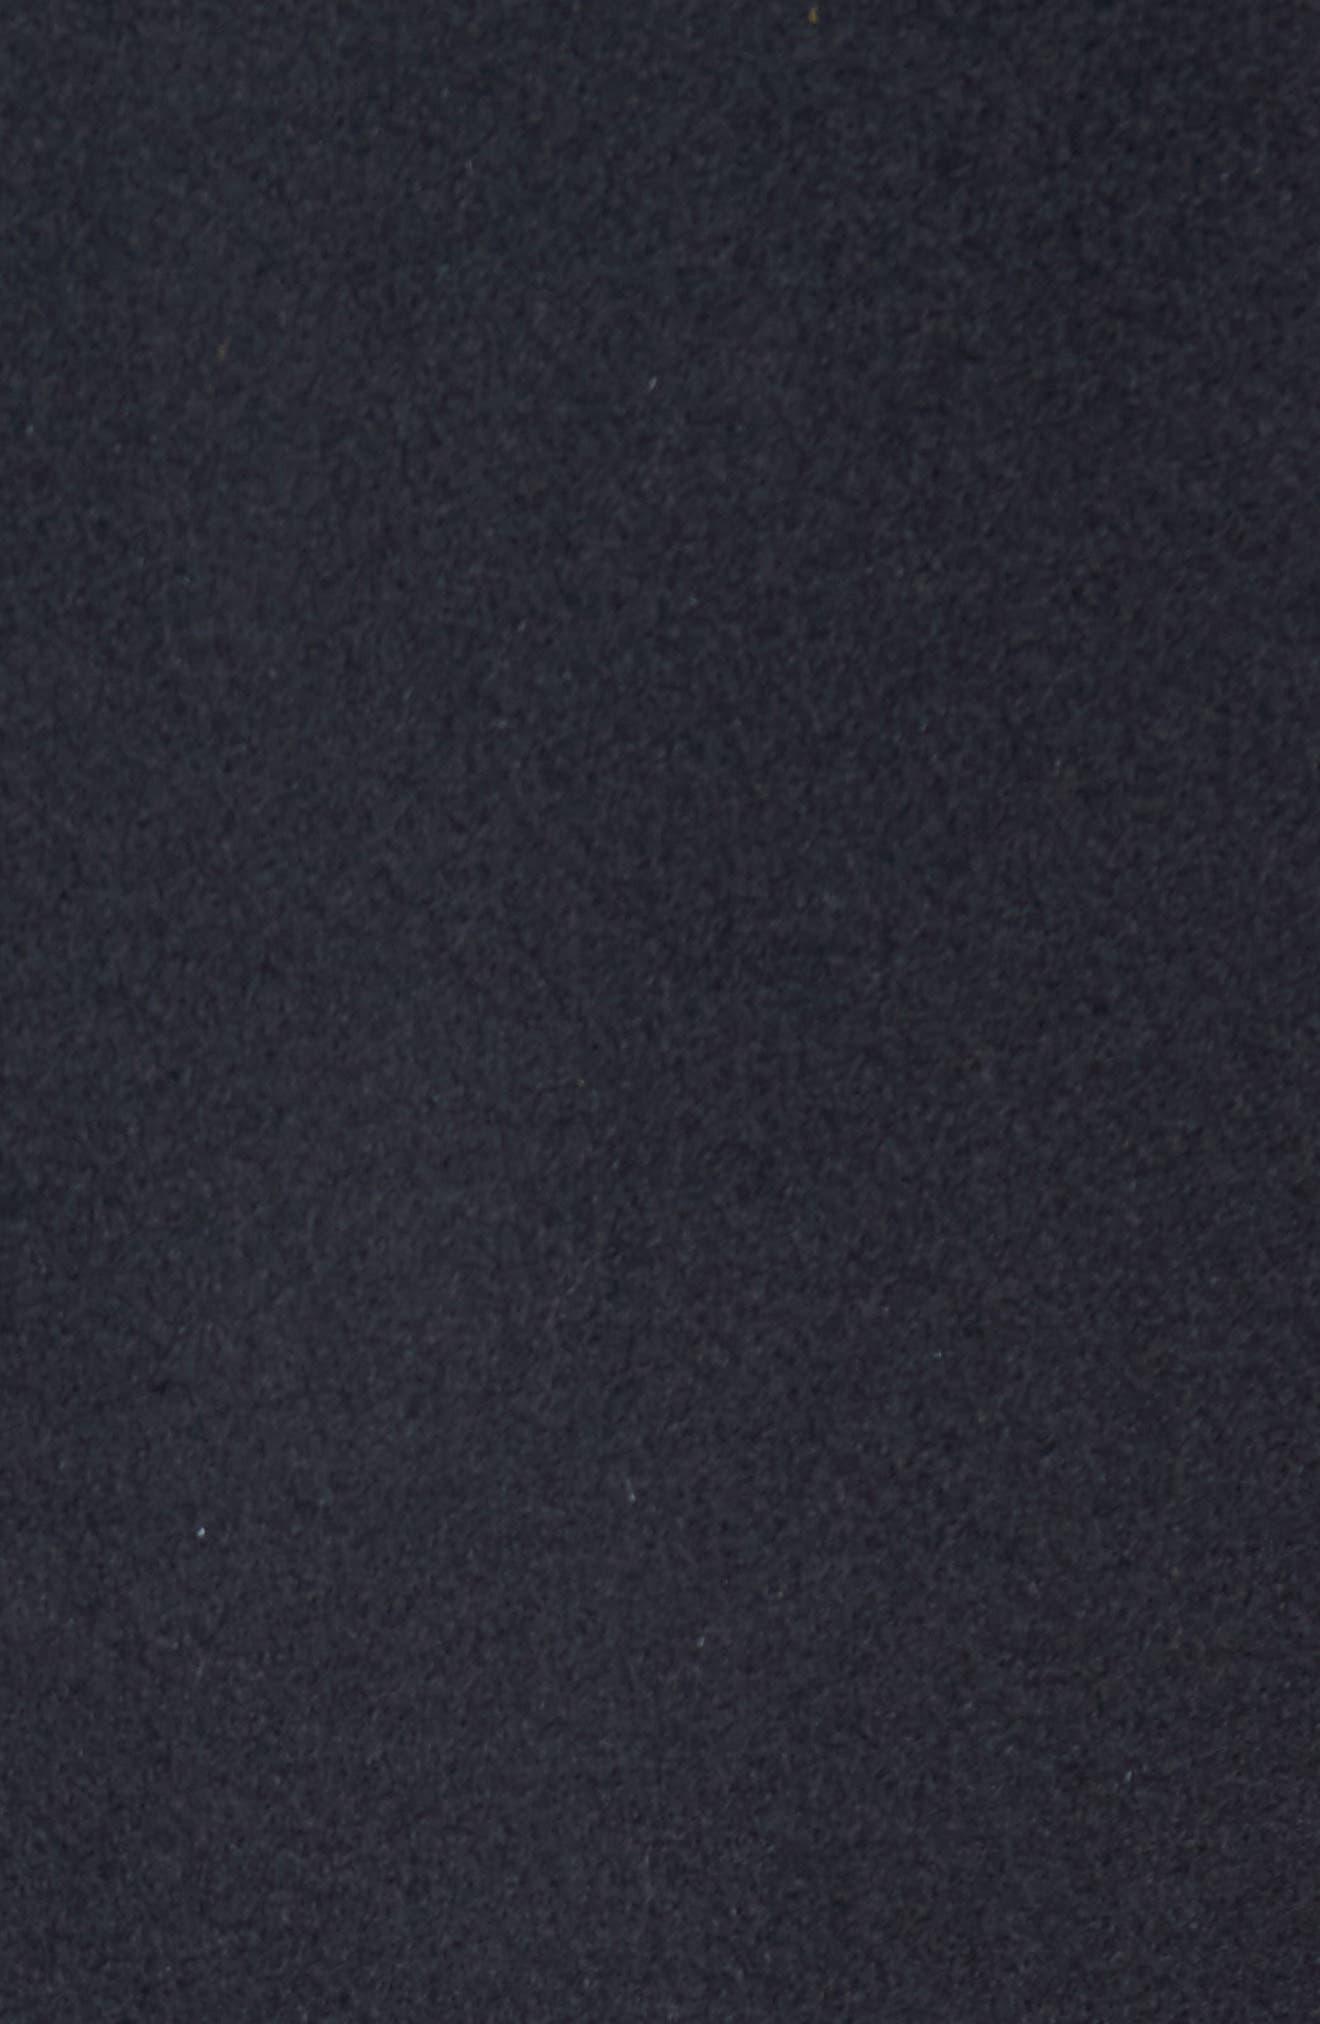 St. Paul Wool & Cashmere Topcoat,                             Alternate thumbnail 5, color,                             410